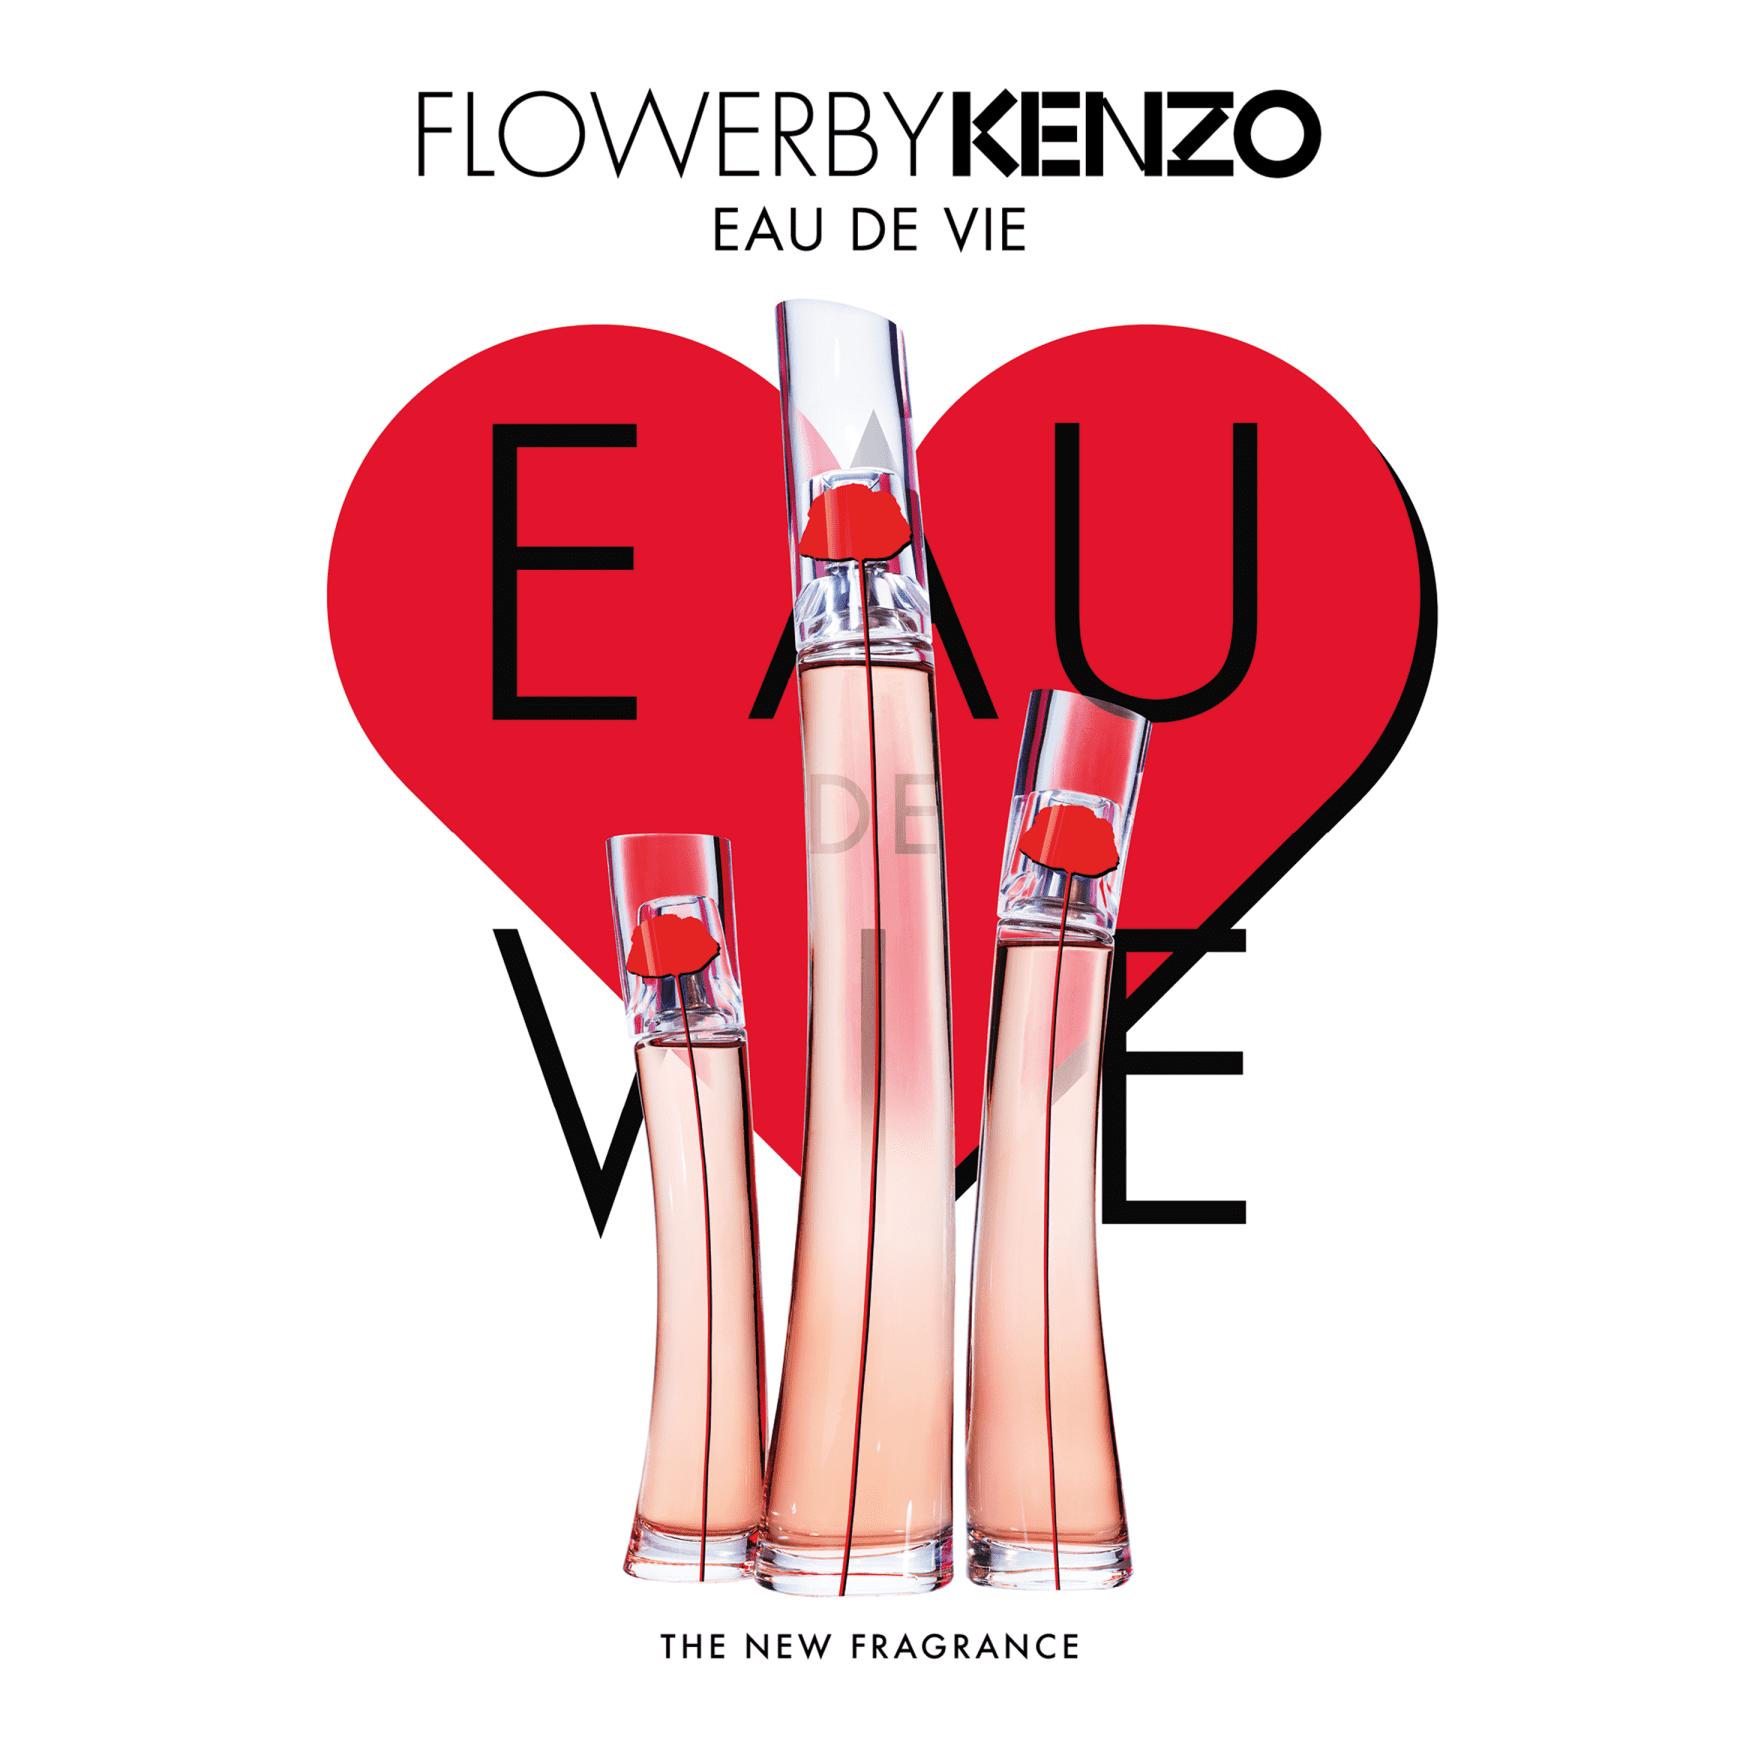 Flower-by-Kenzo-Eau-de-Vie-Banner-01.png